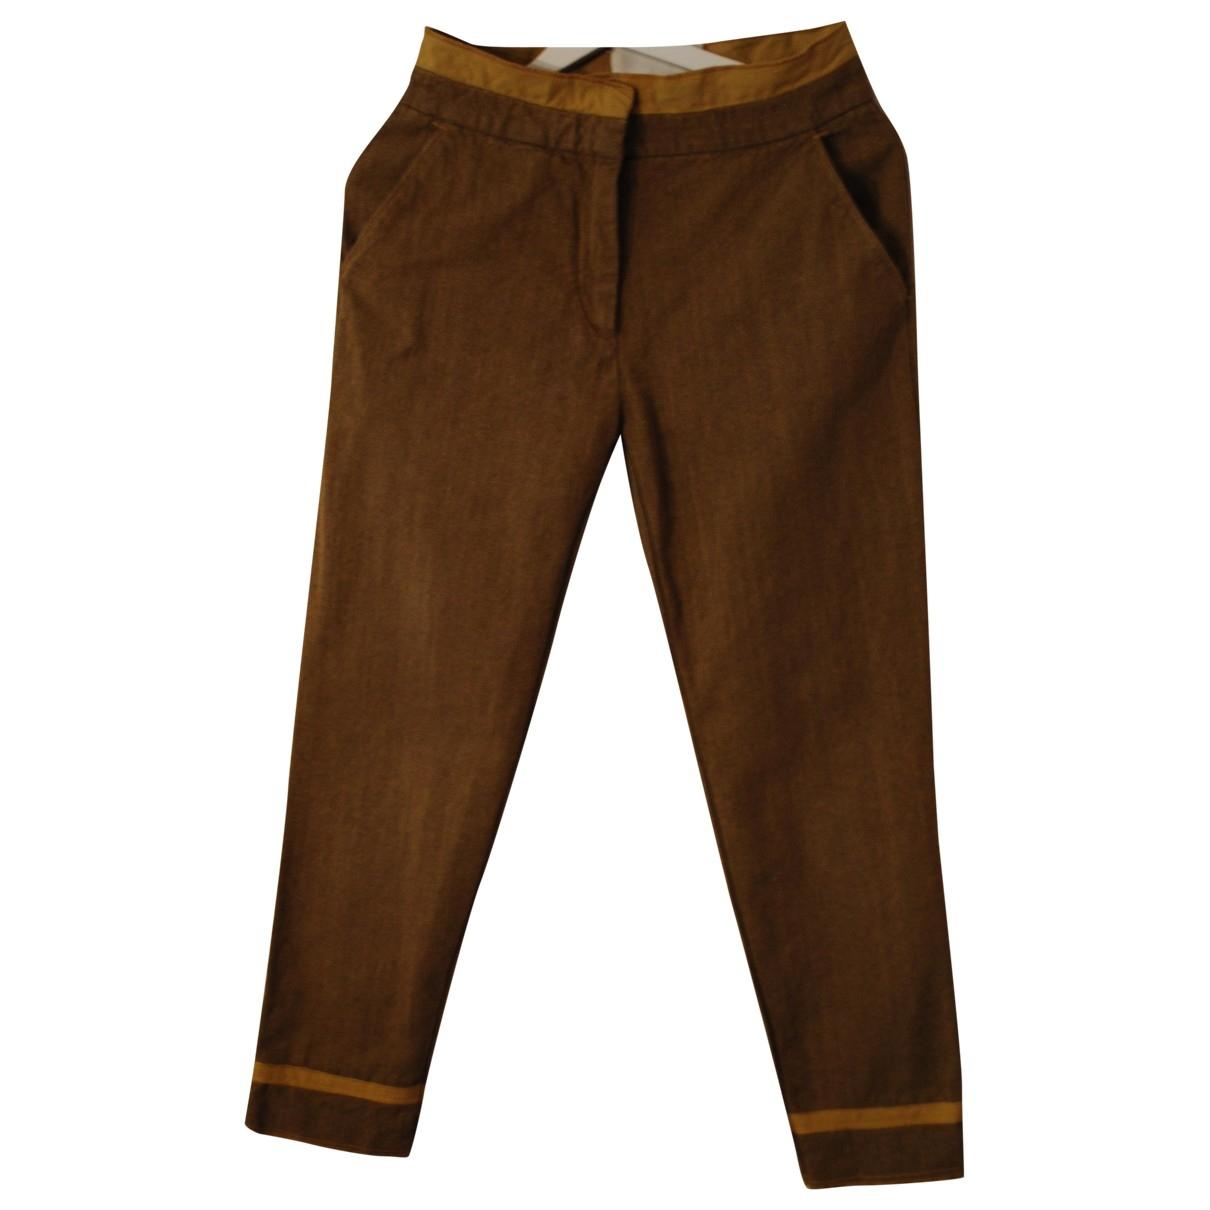 Maison Martin Margiela \N Khaki Cotton Trousers for Women 42 IT